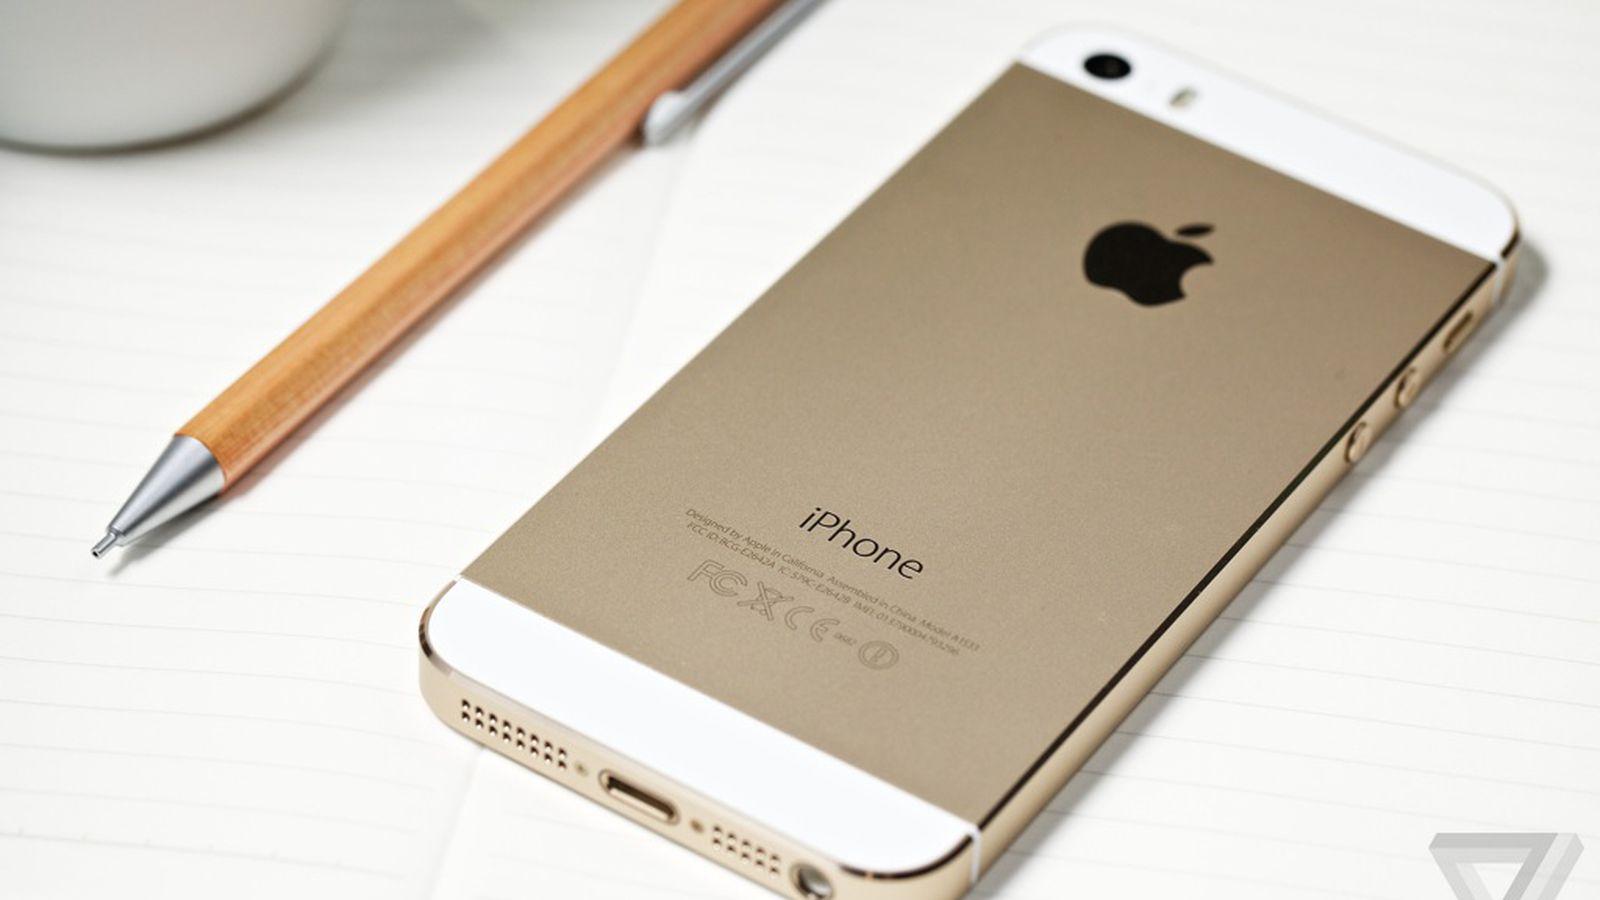 Iphone 5s Review The Verge Lock Ampamp Ordinary Crisper Hpl810c360ml